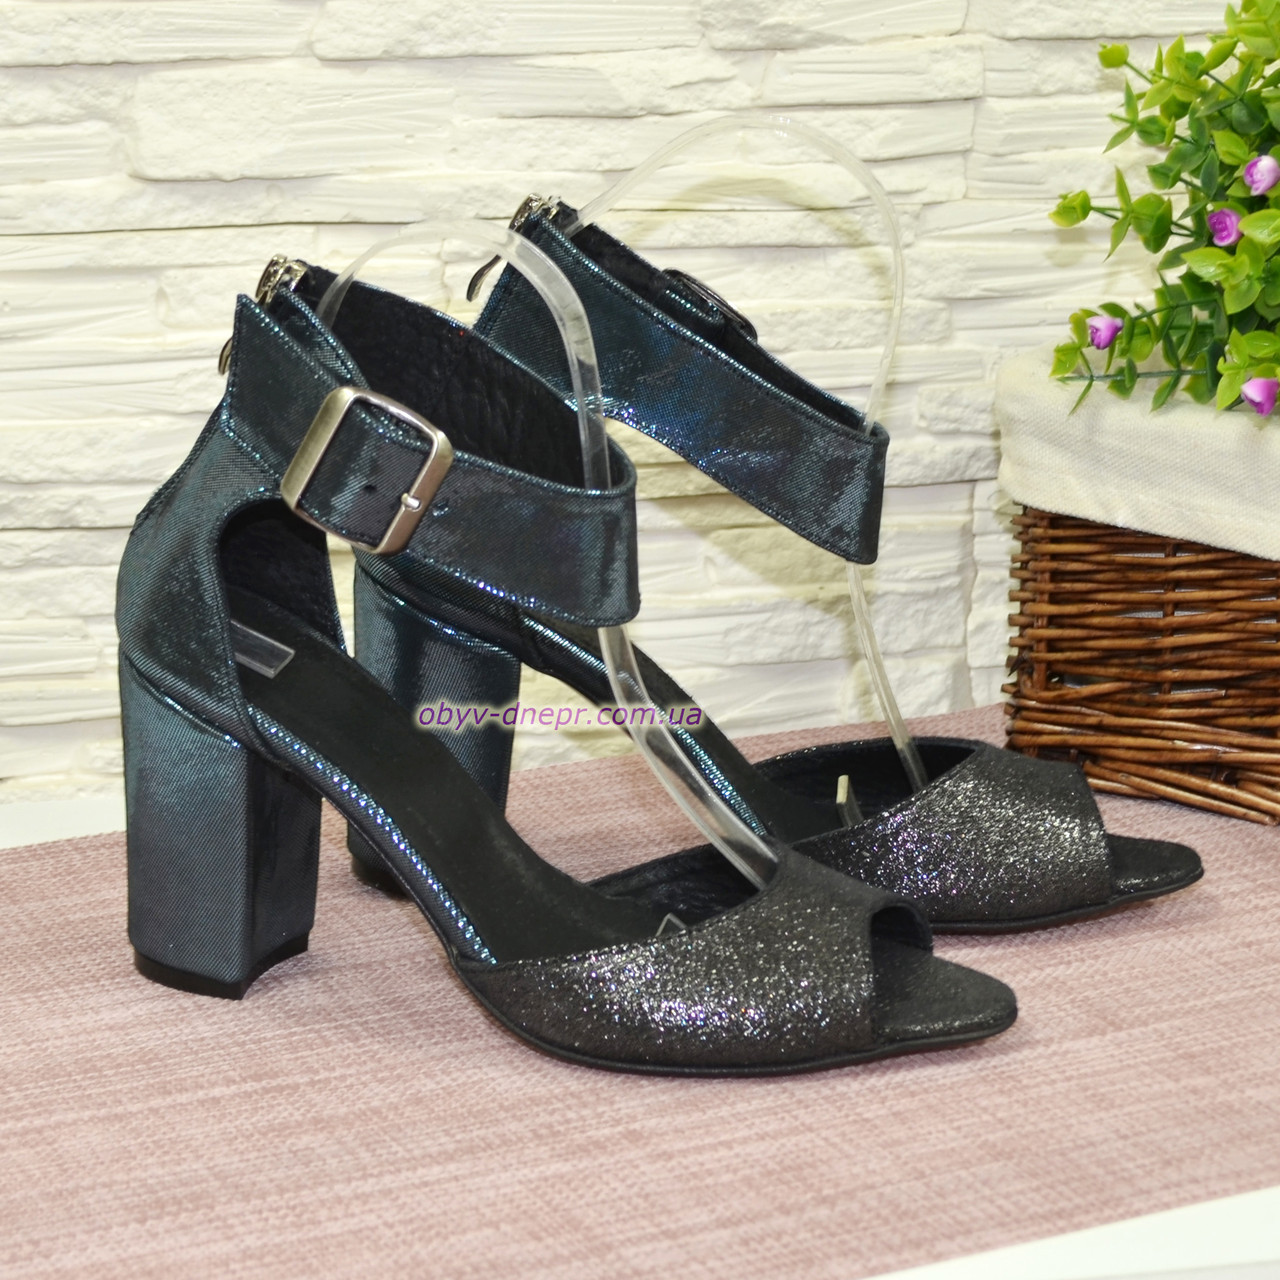 Босоножки женские замшевые на устойчивом каблуке